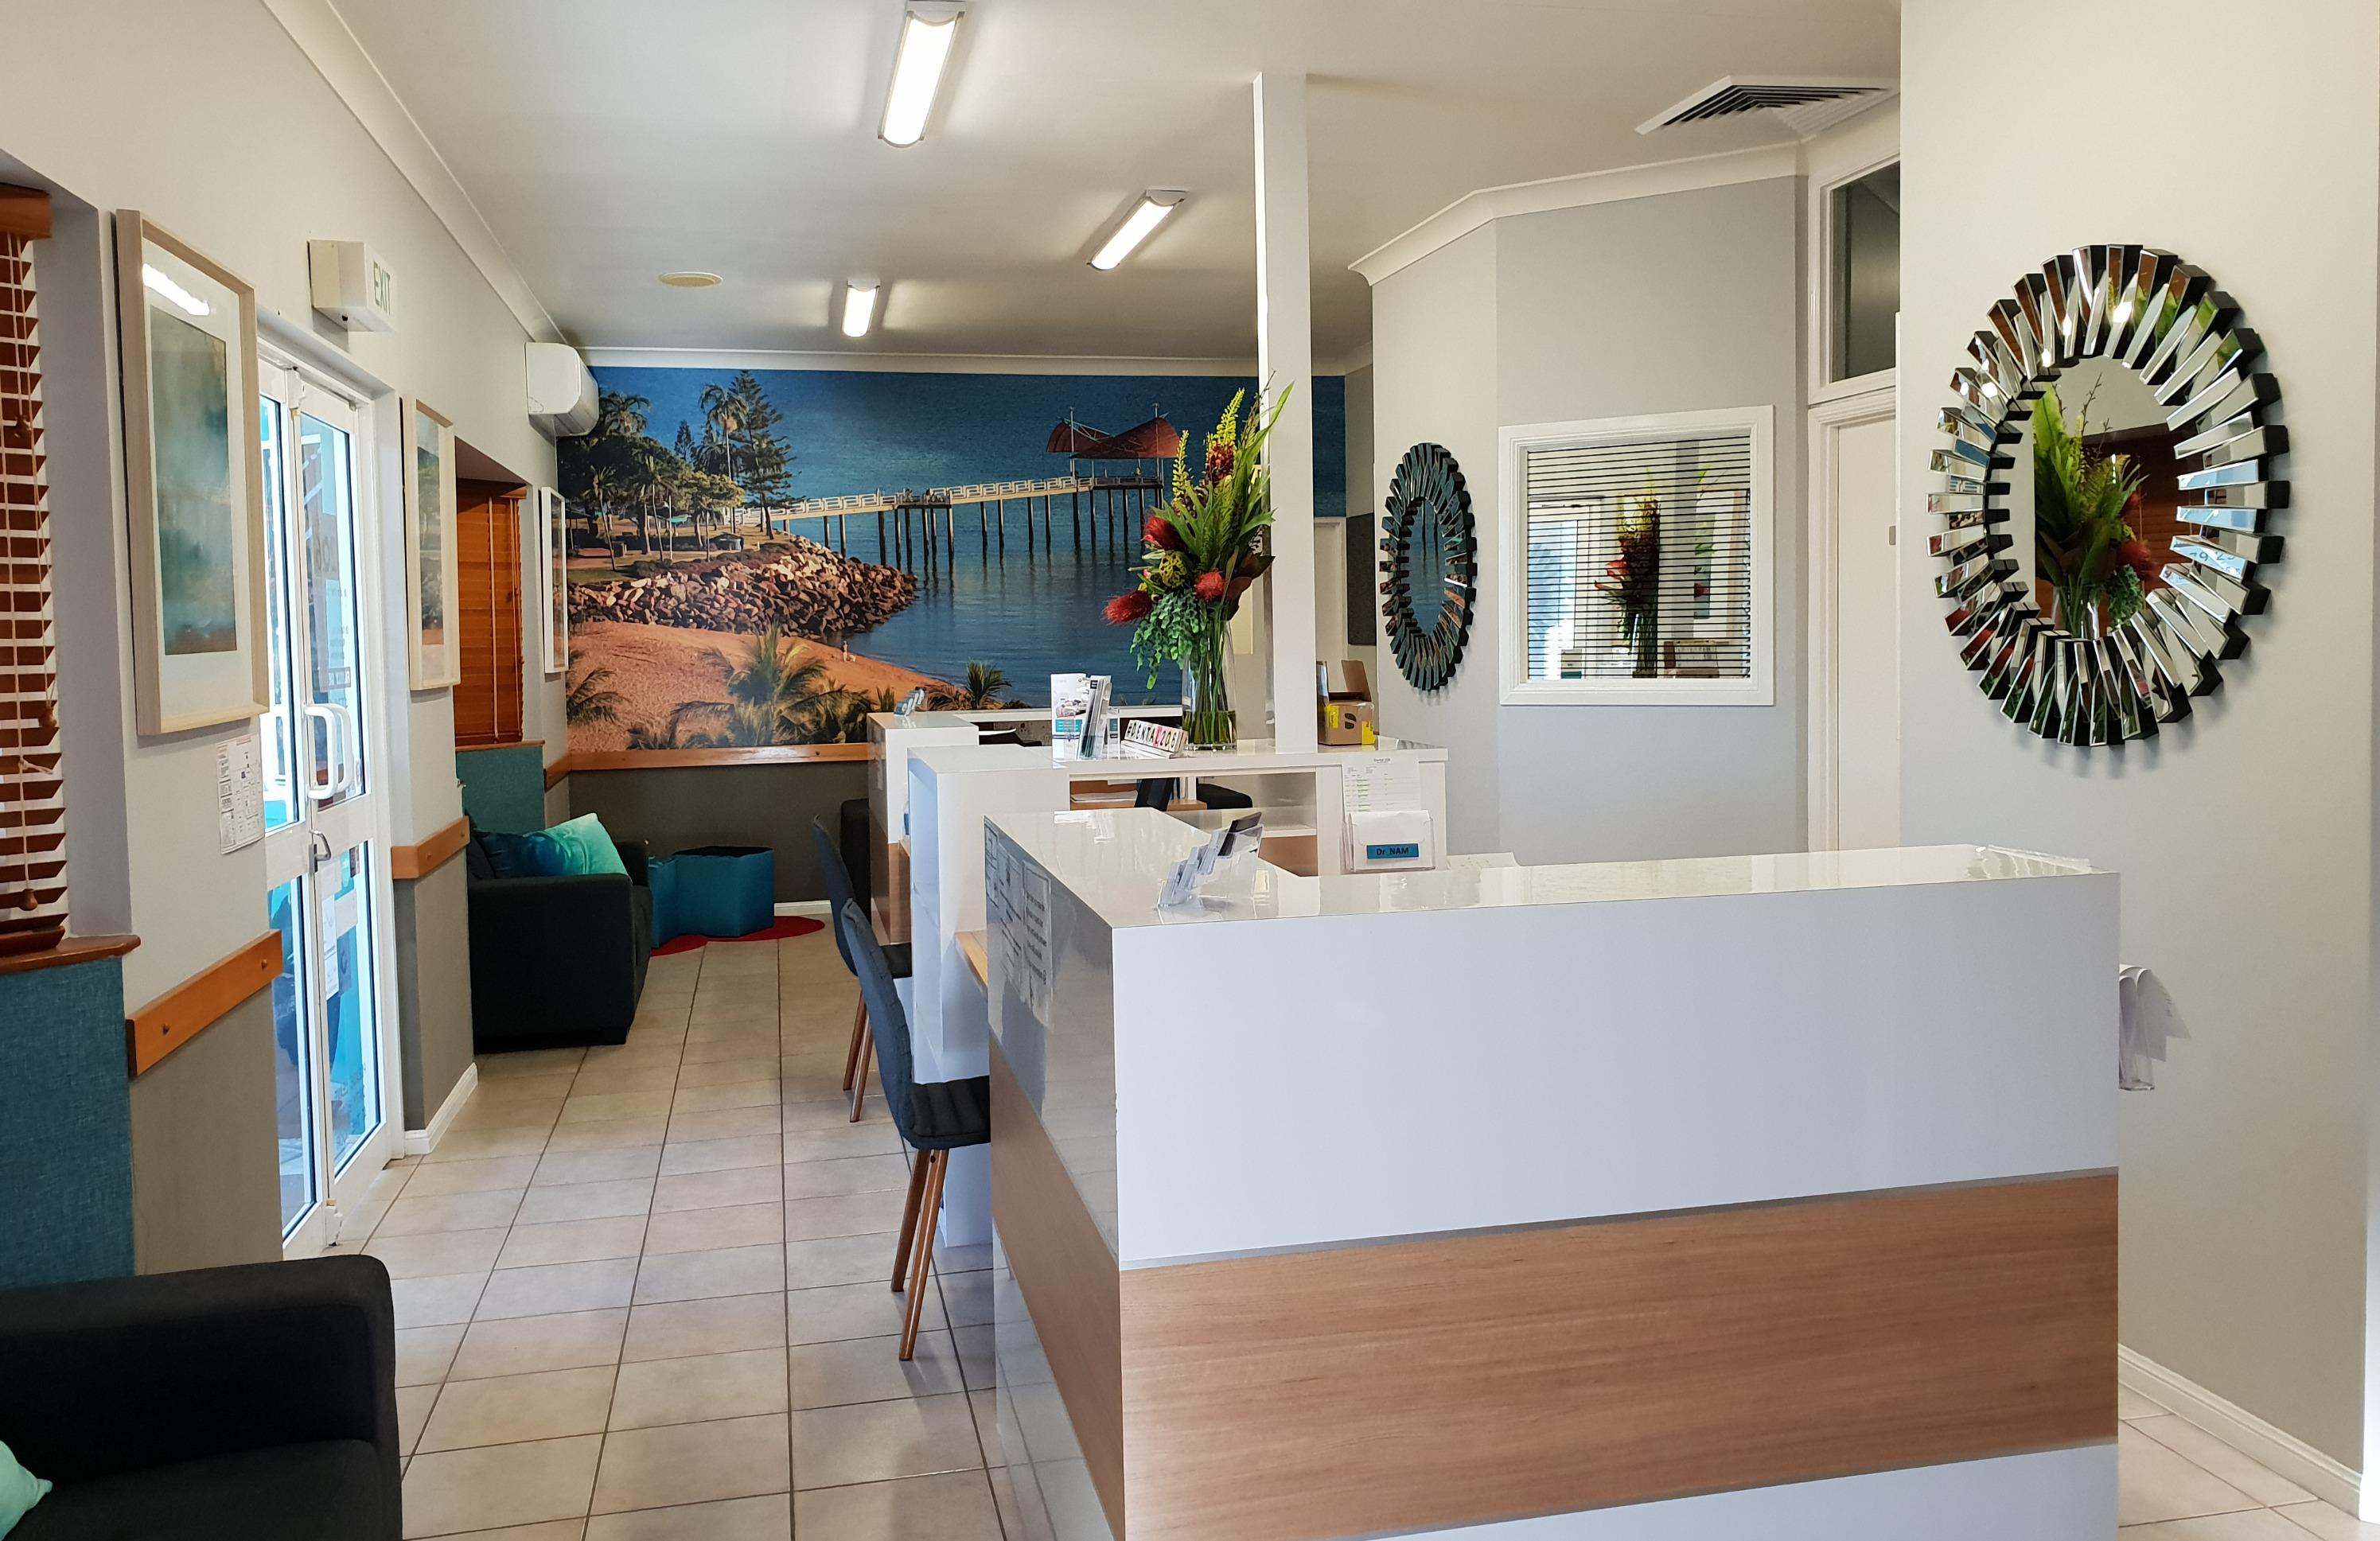 Dental 206 Townsville Waiting Room 2_edi